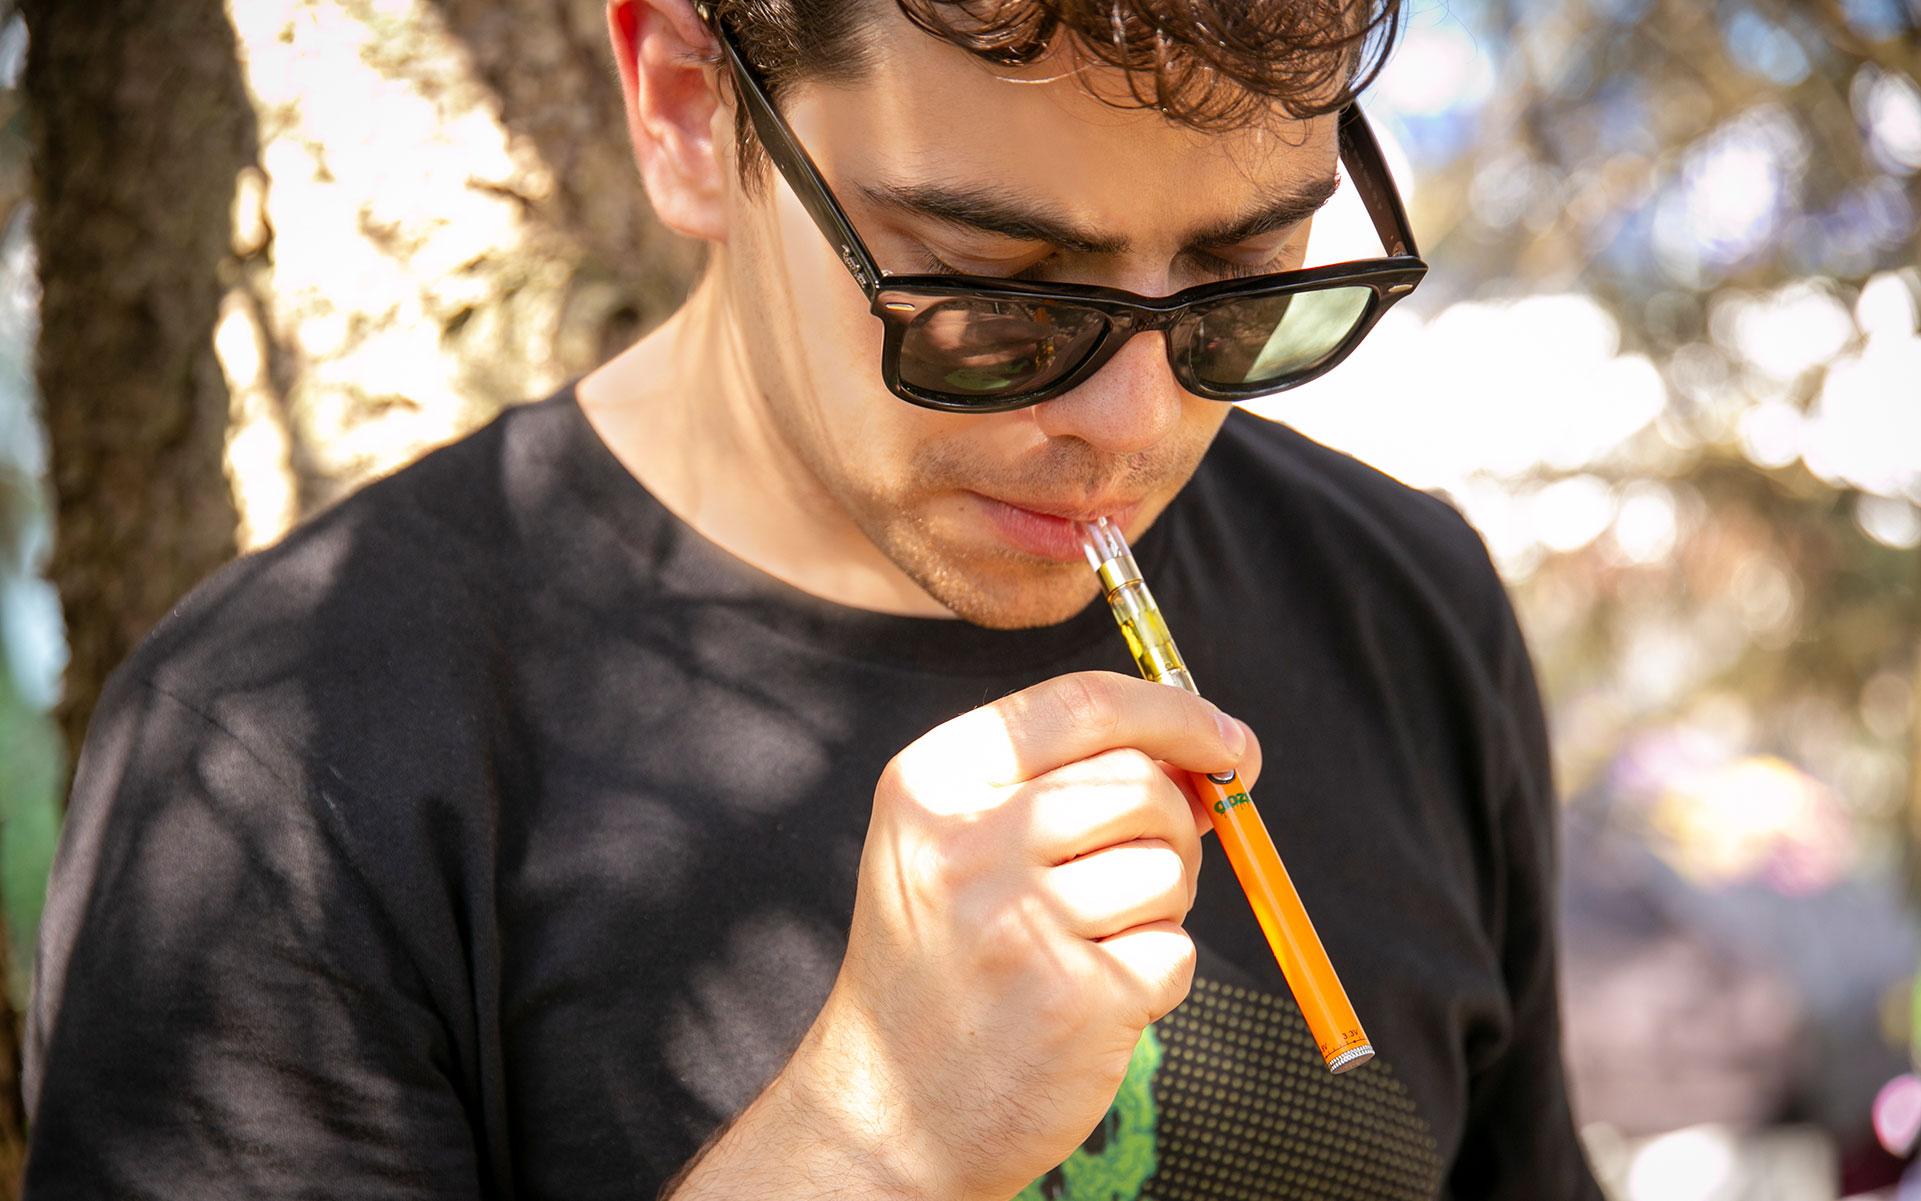 man in sunglasses vaping cannabis oil